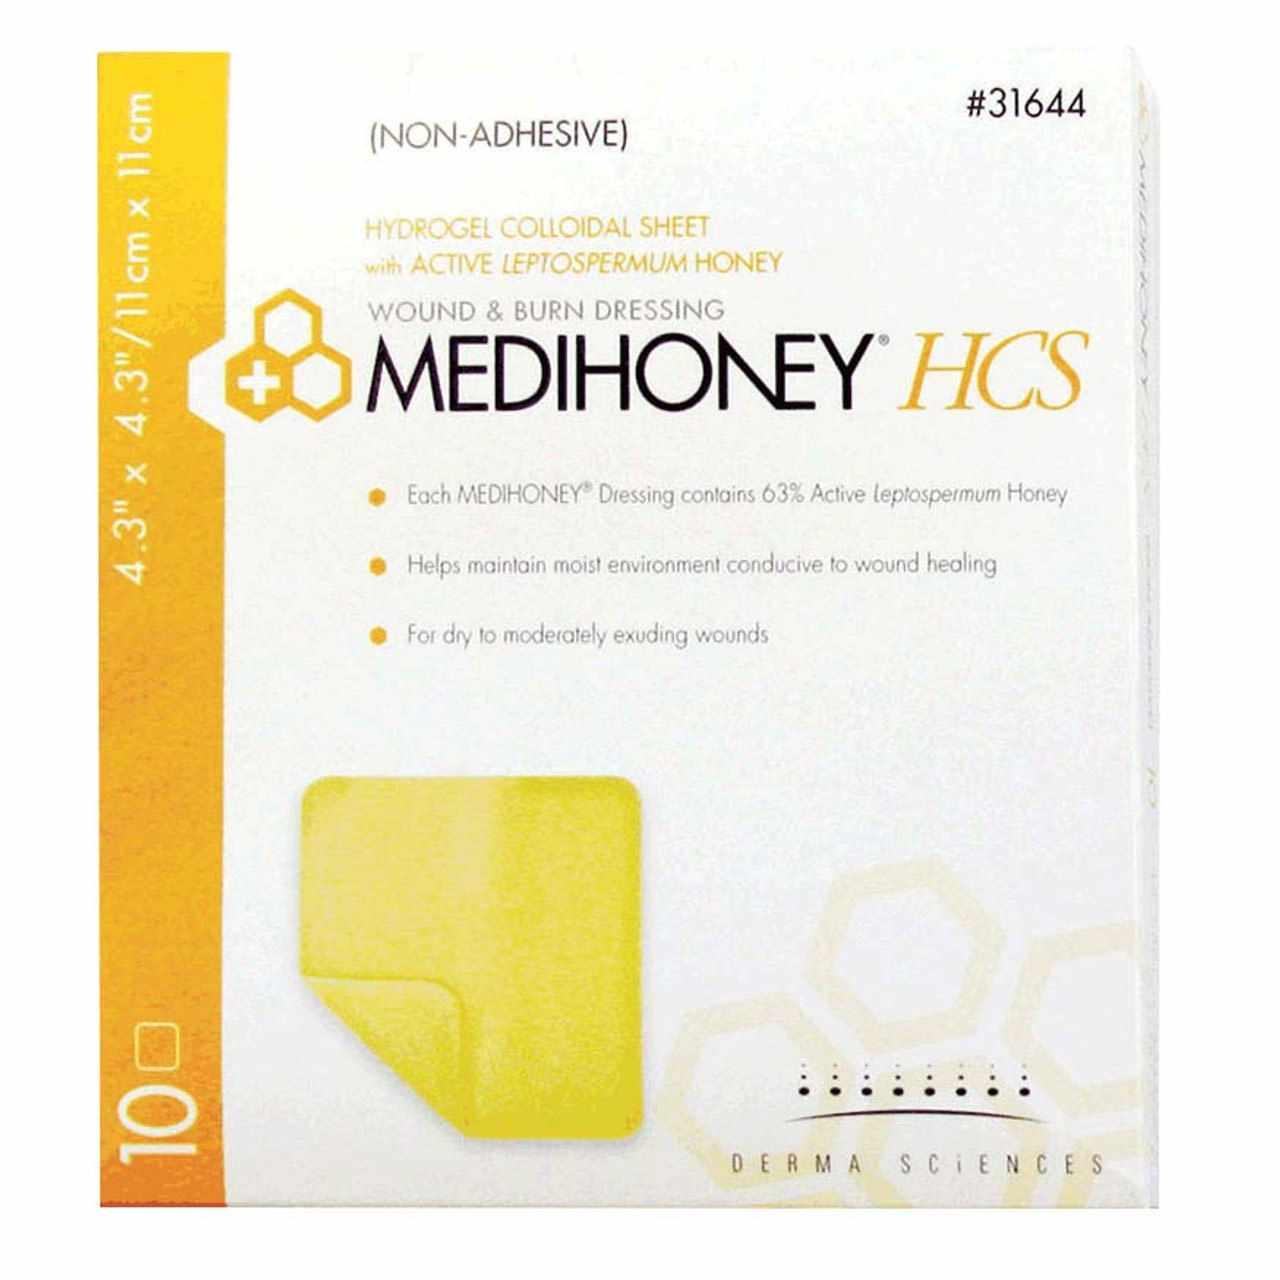 Medihoney Hydrogel Dressing, 4.3 X 4.3 Inch, Sterile